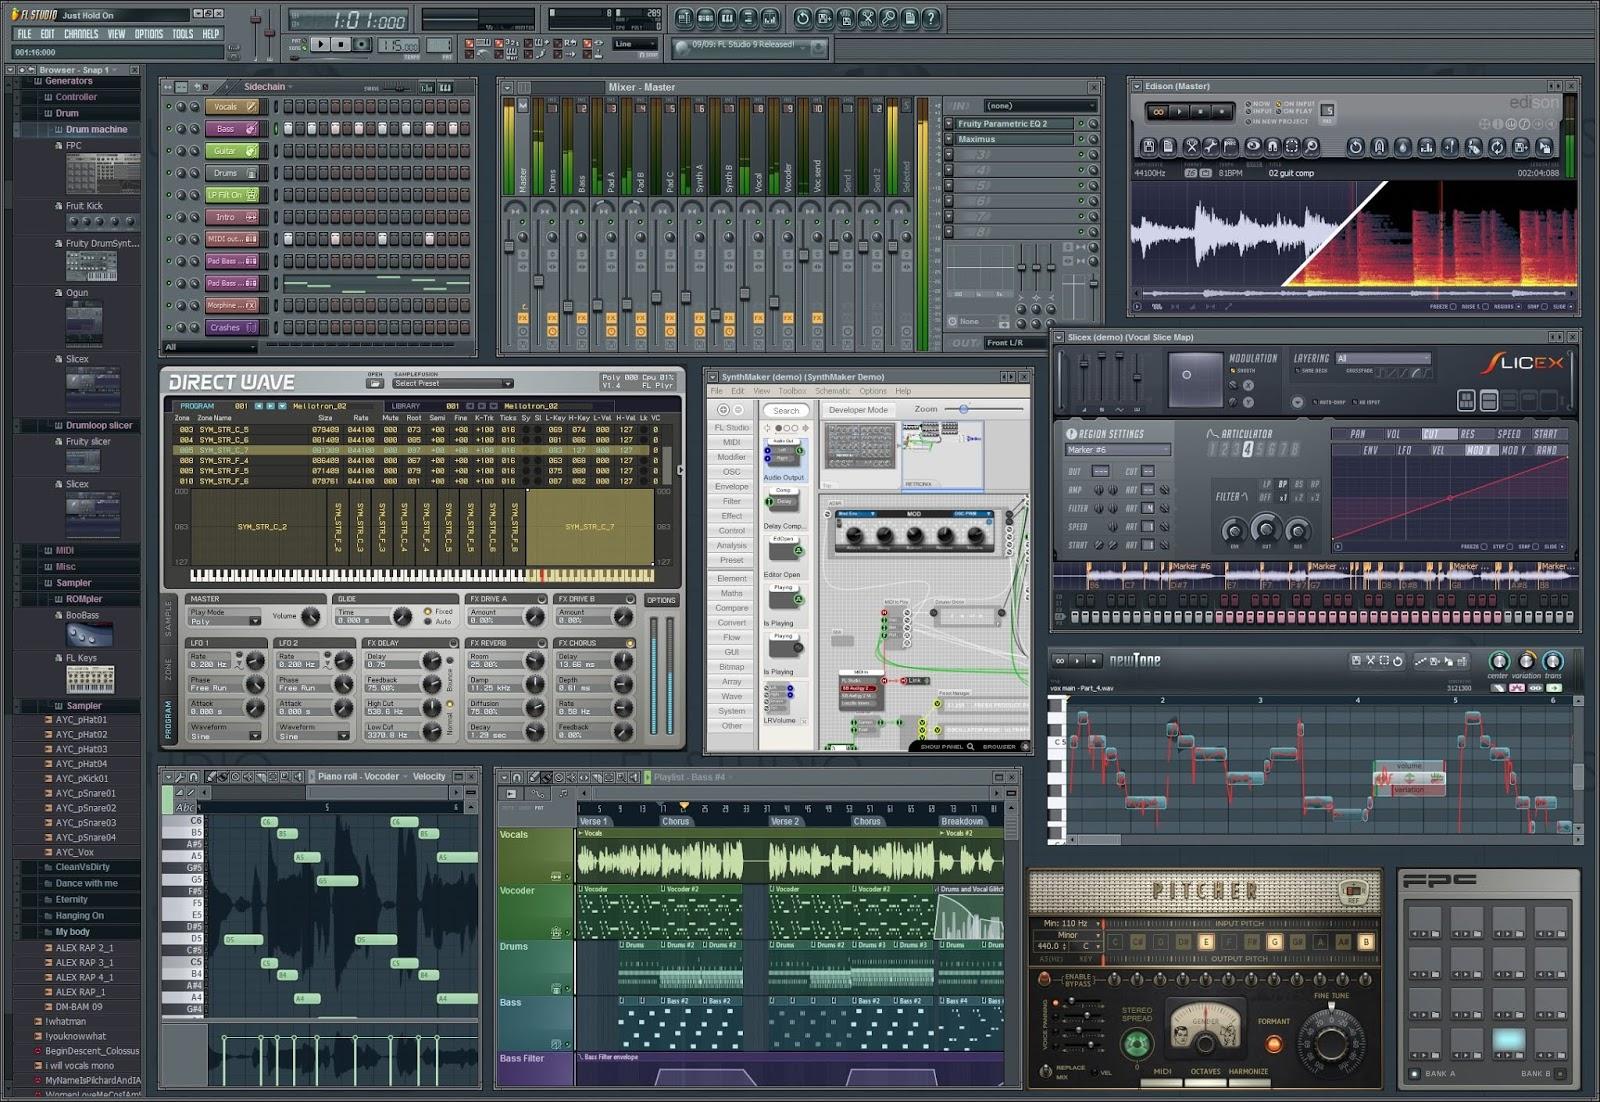 fl studio producer edition 20.0.1 build 455